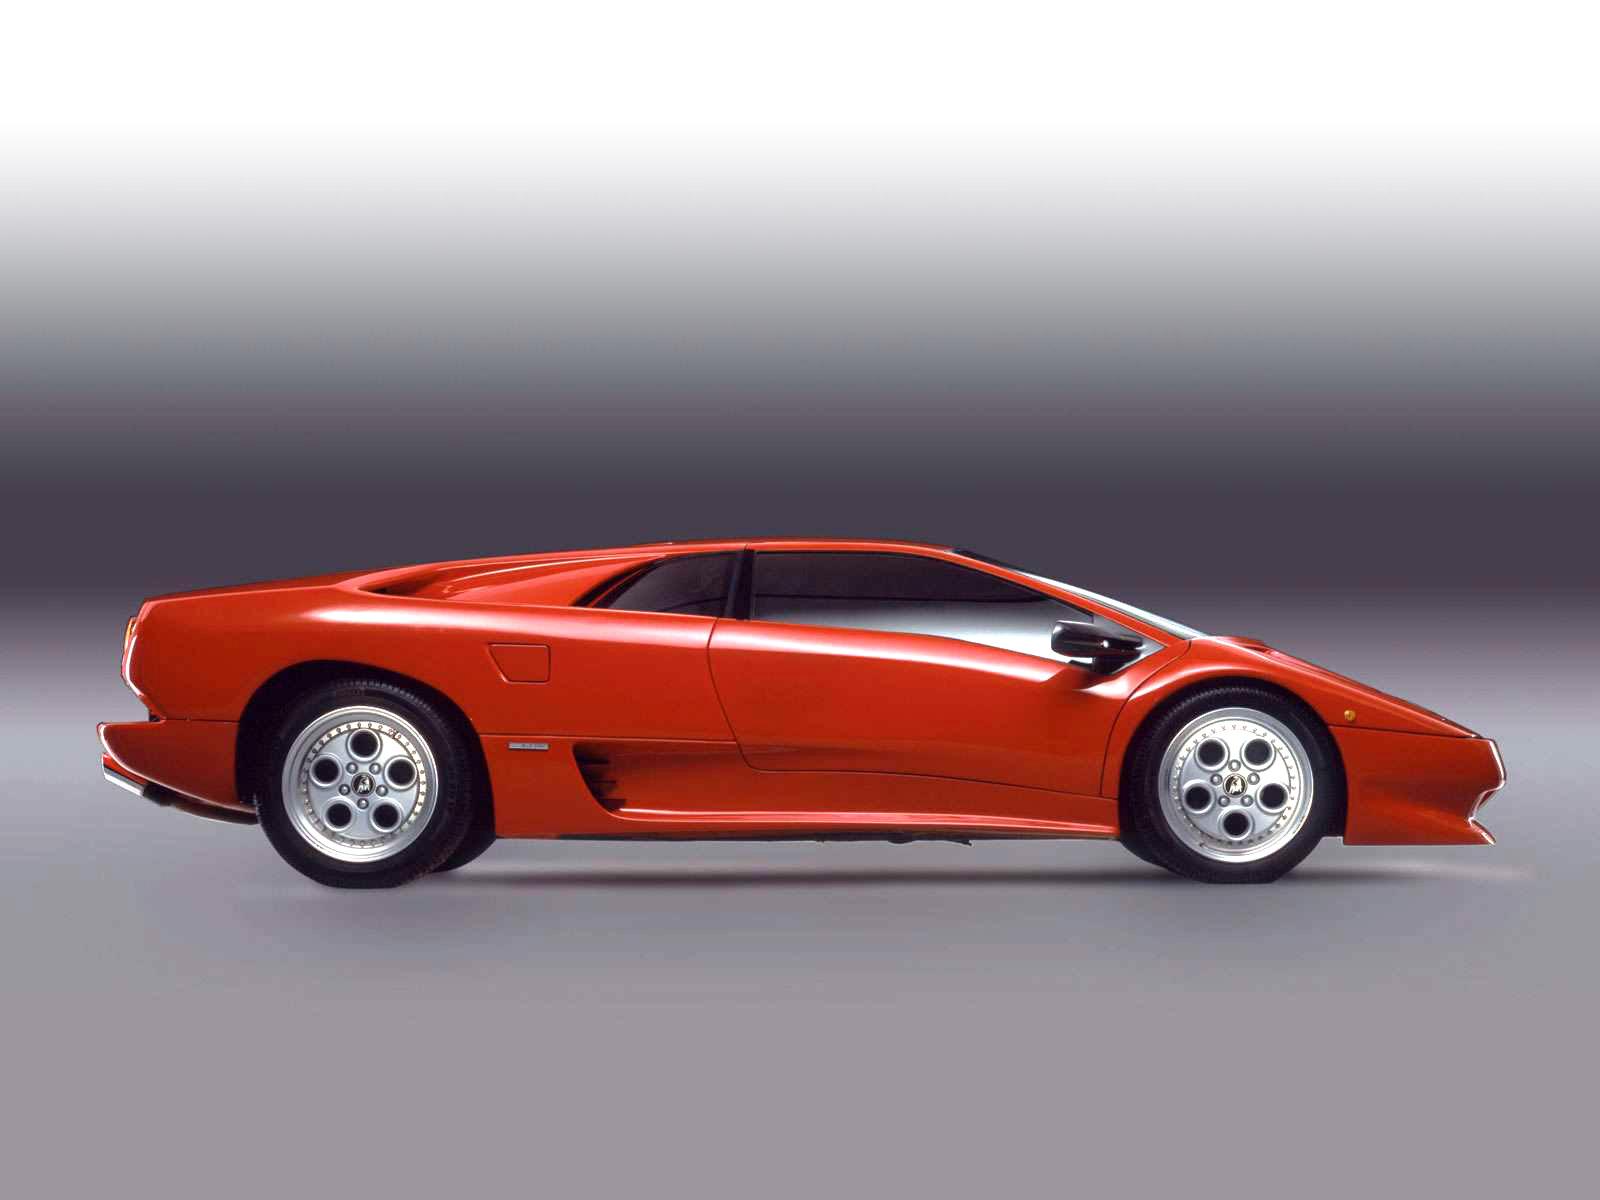 Lamborghini Diablo 1990 >> Lamborghini Wallpapers 1990 Lamborghini Diablo Car Accident